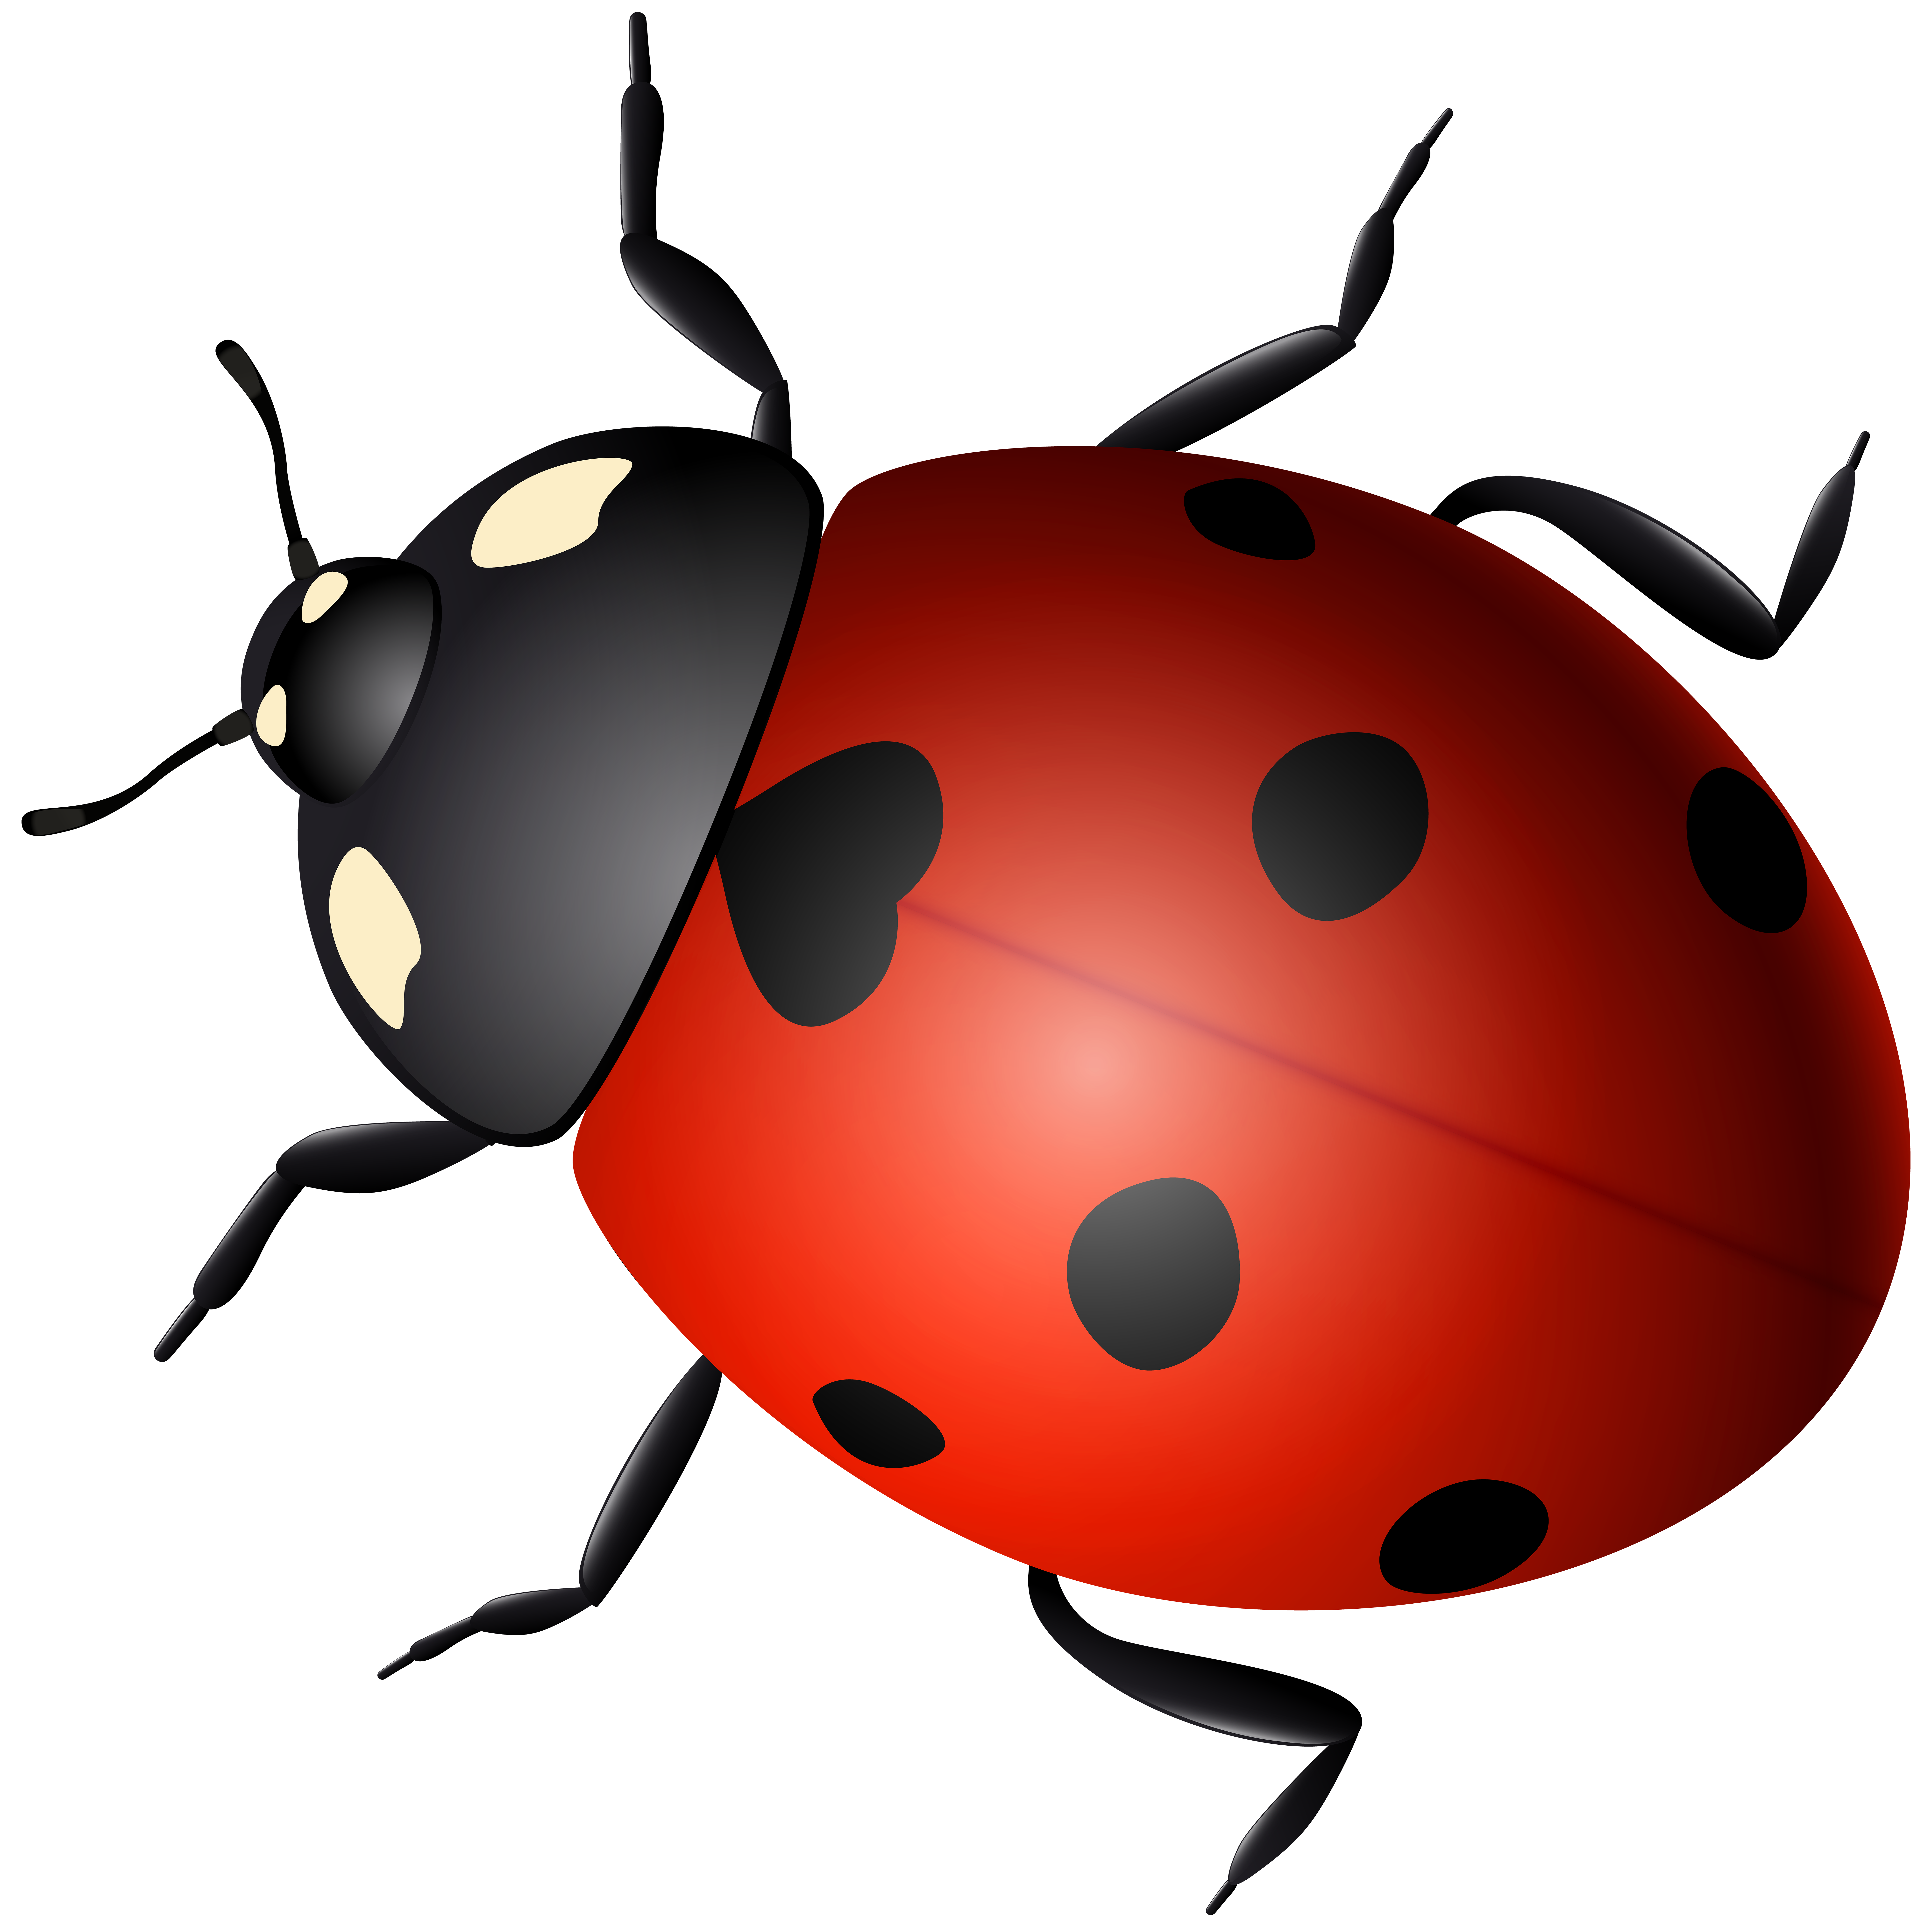 freeuse stock Ladybird clip art transprent. Beetle clipart arthropod.